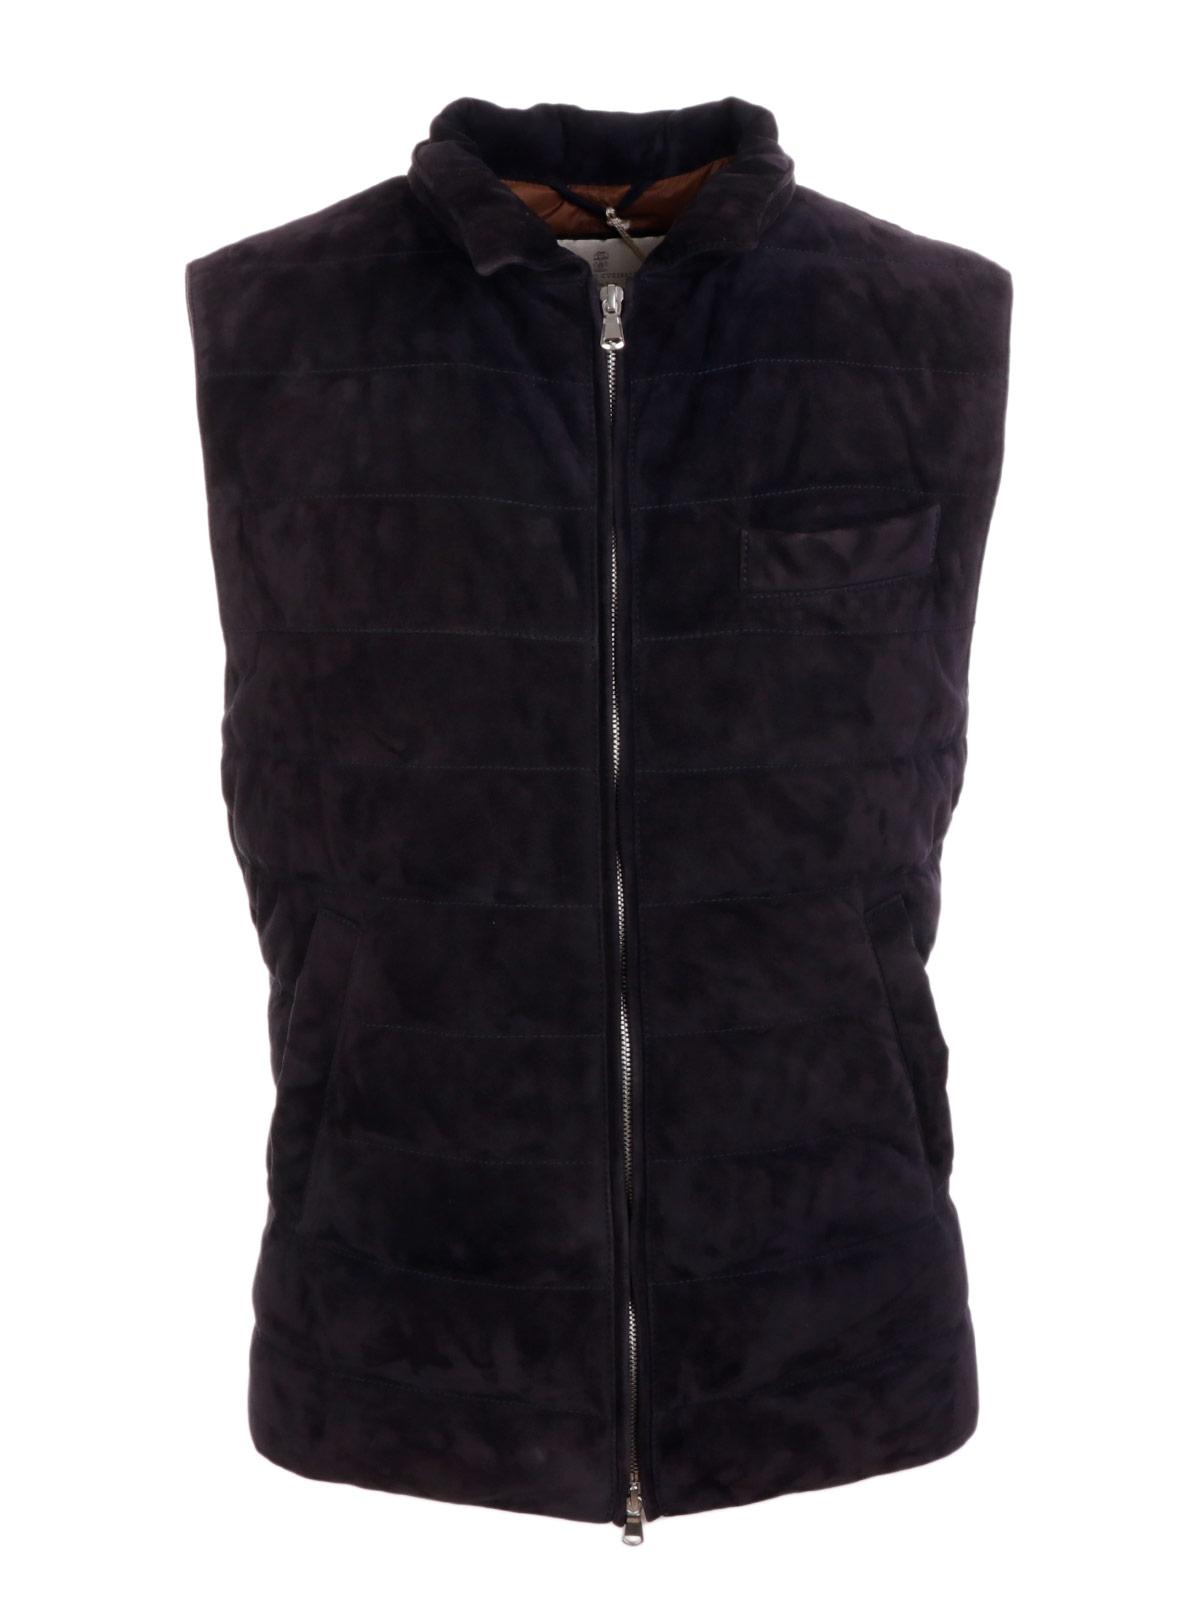 Picture of BRUNELLO CUCINELLI | Men's Suede Vest